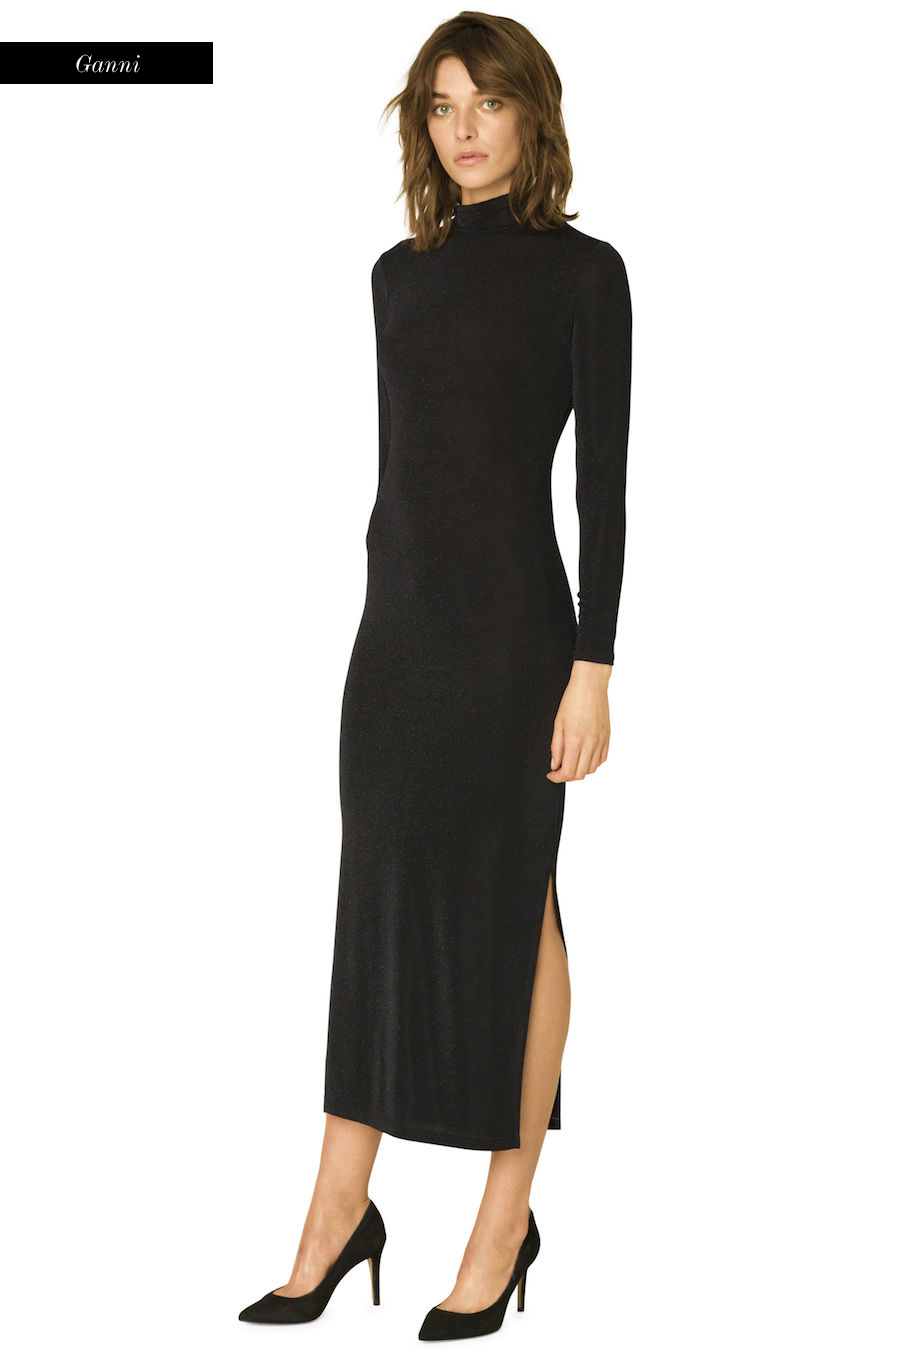 Maxi dress under 200 fash-n-chips.com 9